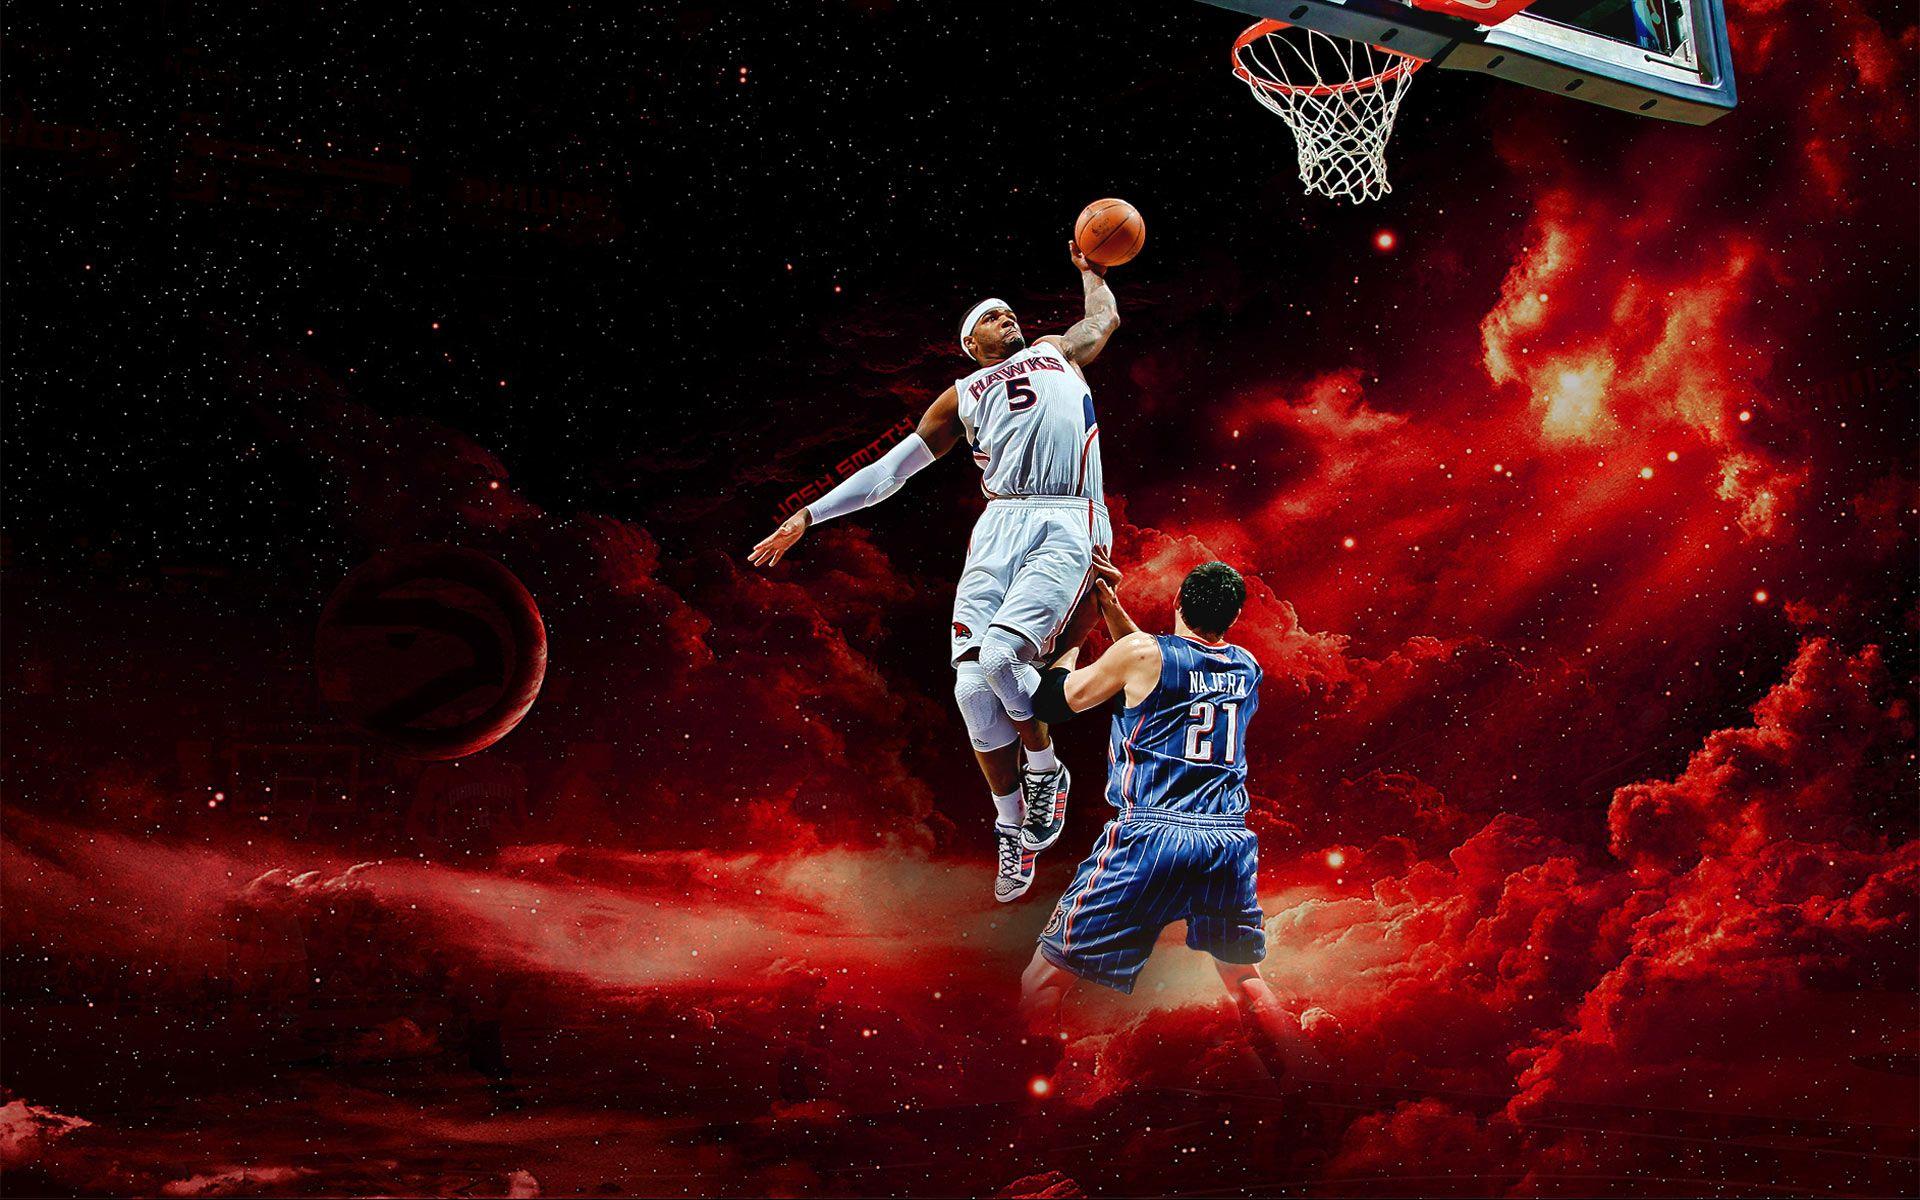 Nba Wallpaper Images Tek Sports Wallpapers Nba Wallpapers Basketball Wallpaper